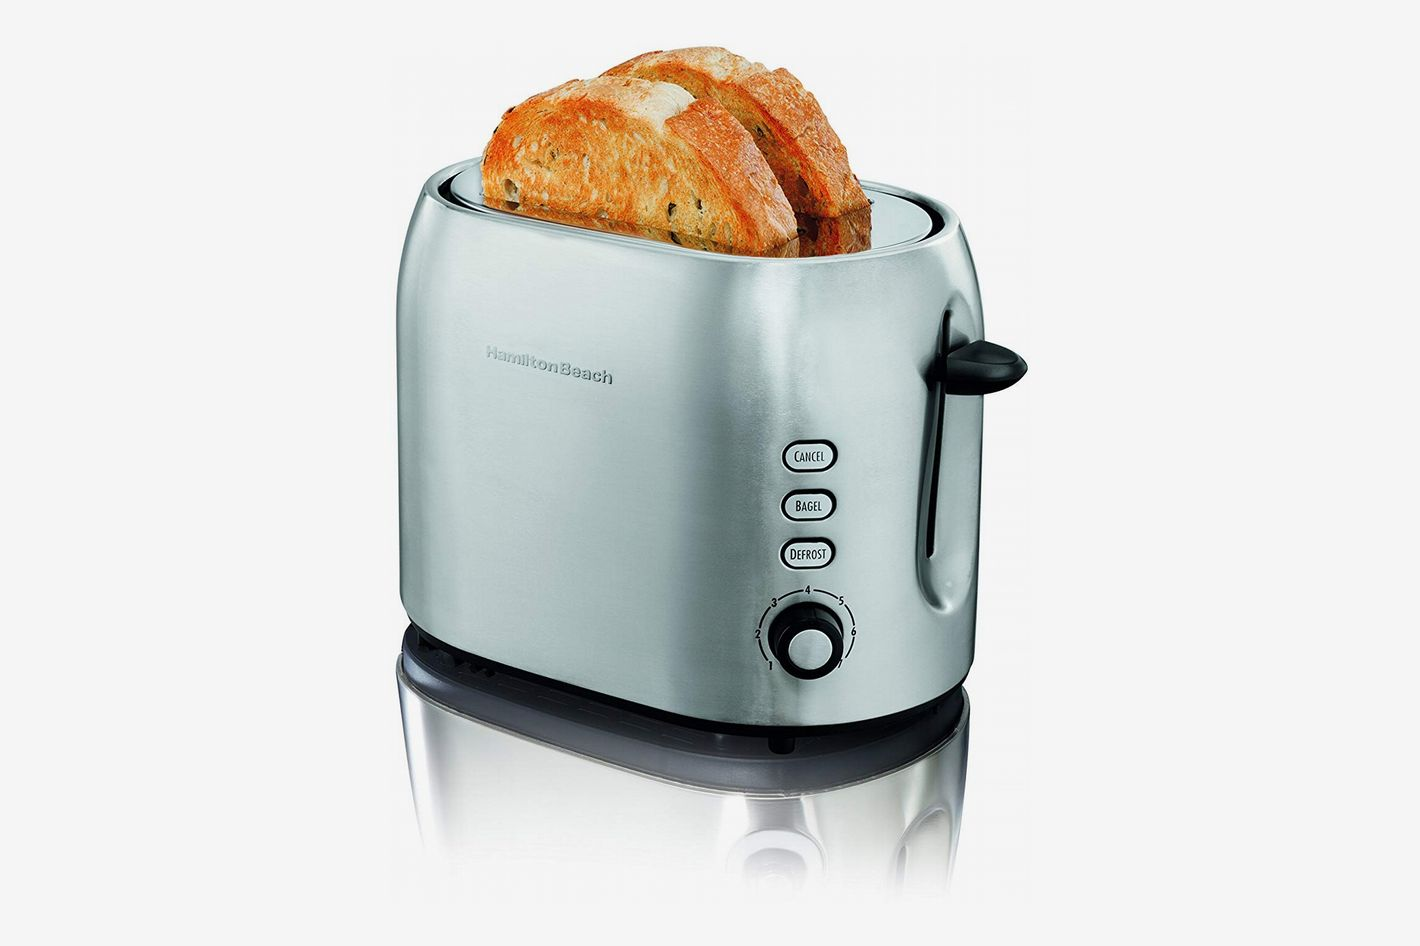 Hamilton Beach 22706 2 Slice Metal Toaster